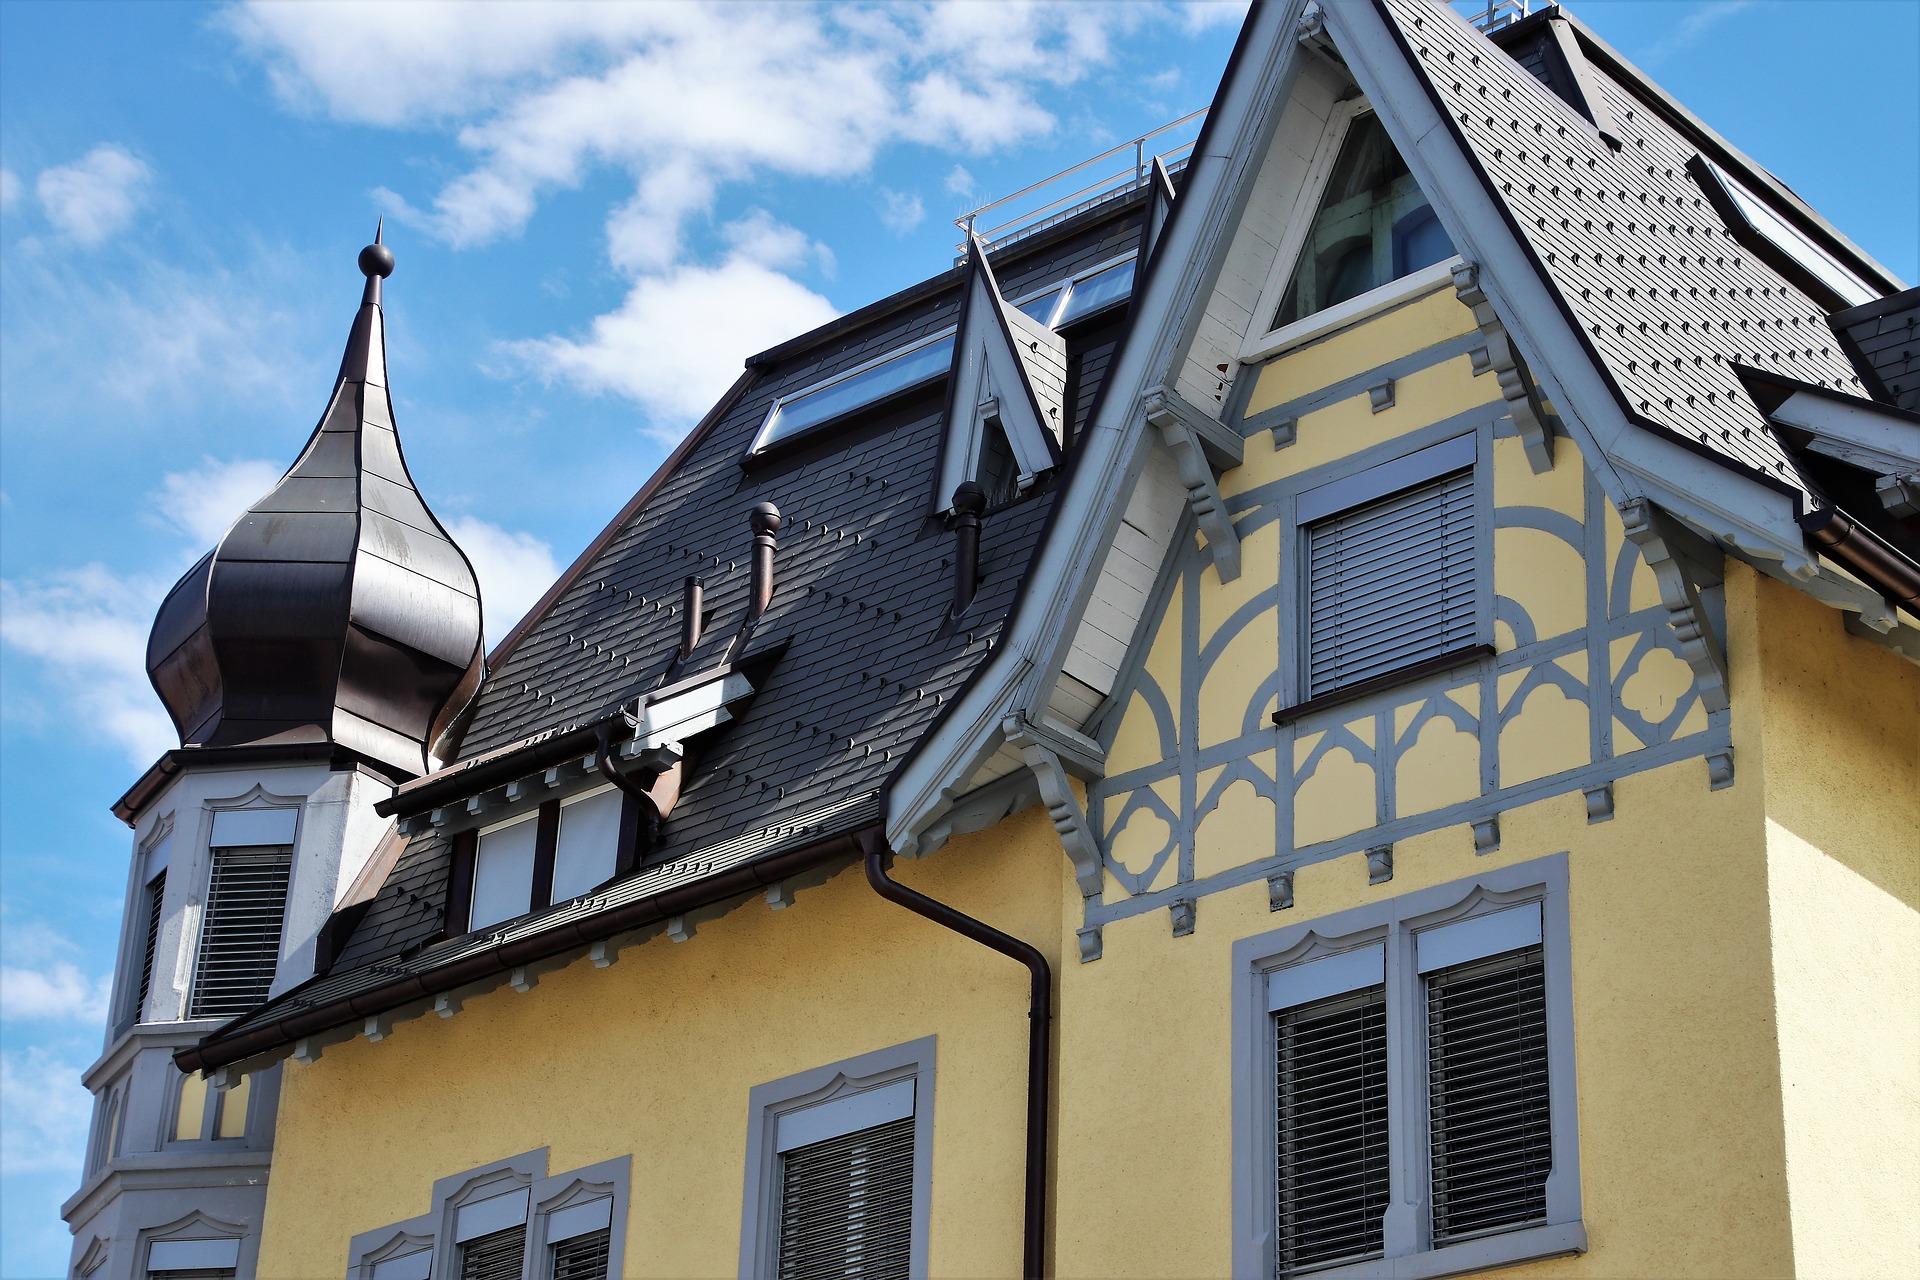 Hübsche Dachgeschosswohnung in 30419 Hannover